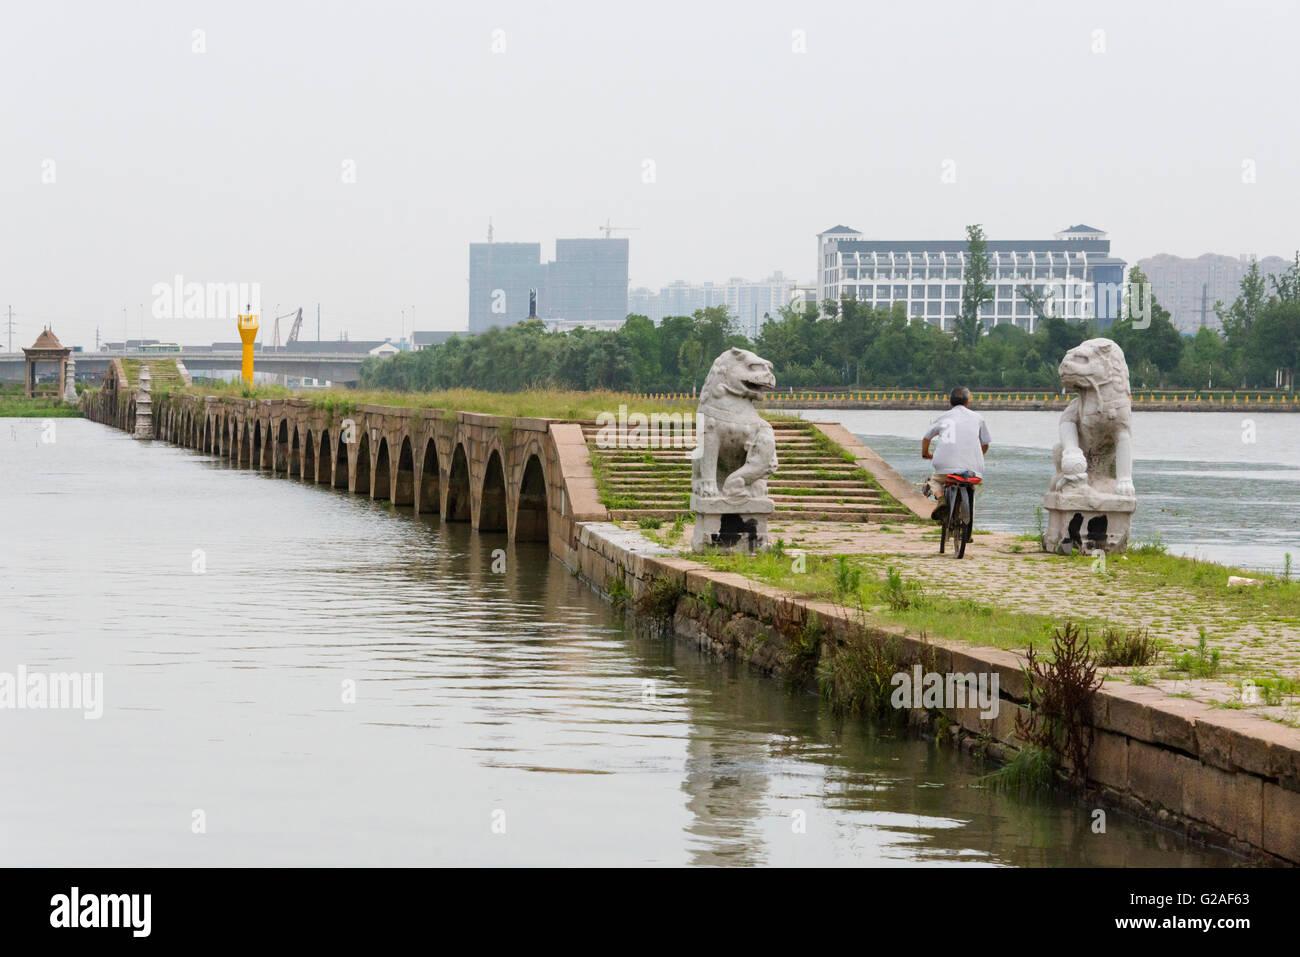 Baodai Bridge with navigation pole on the Grand Canal, Suzhou, Jiangsu Province, China - Stock Image